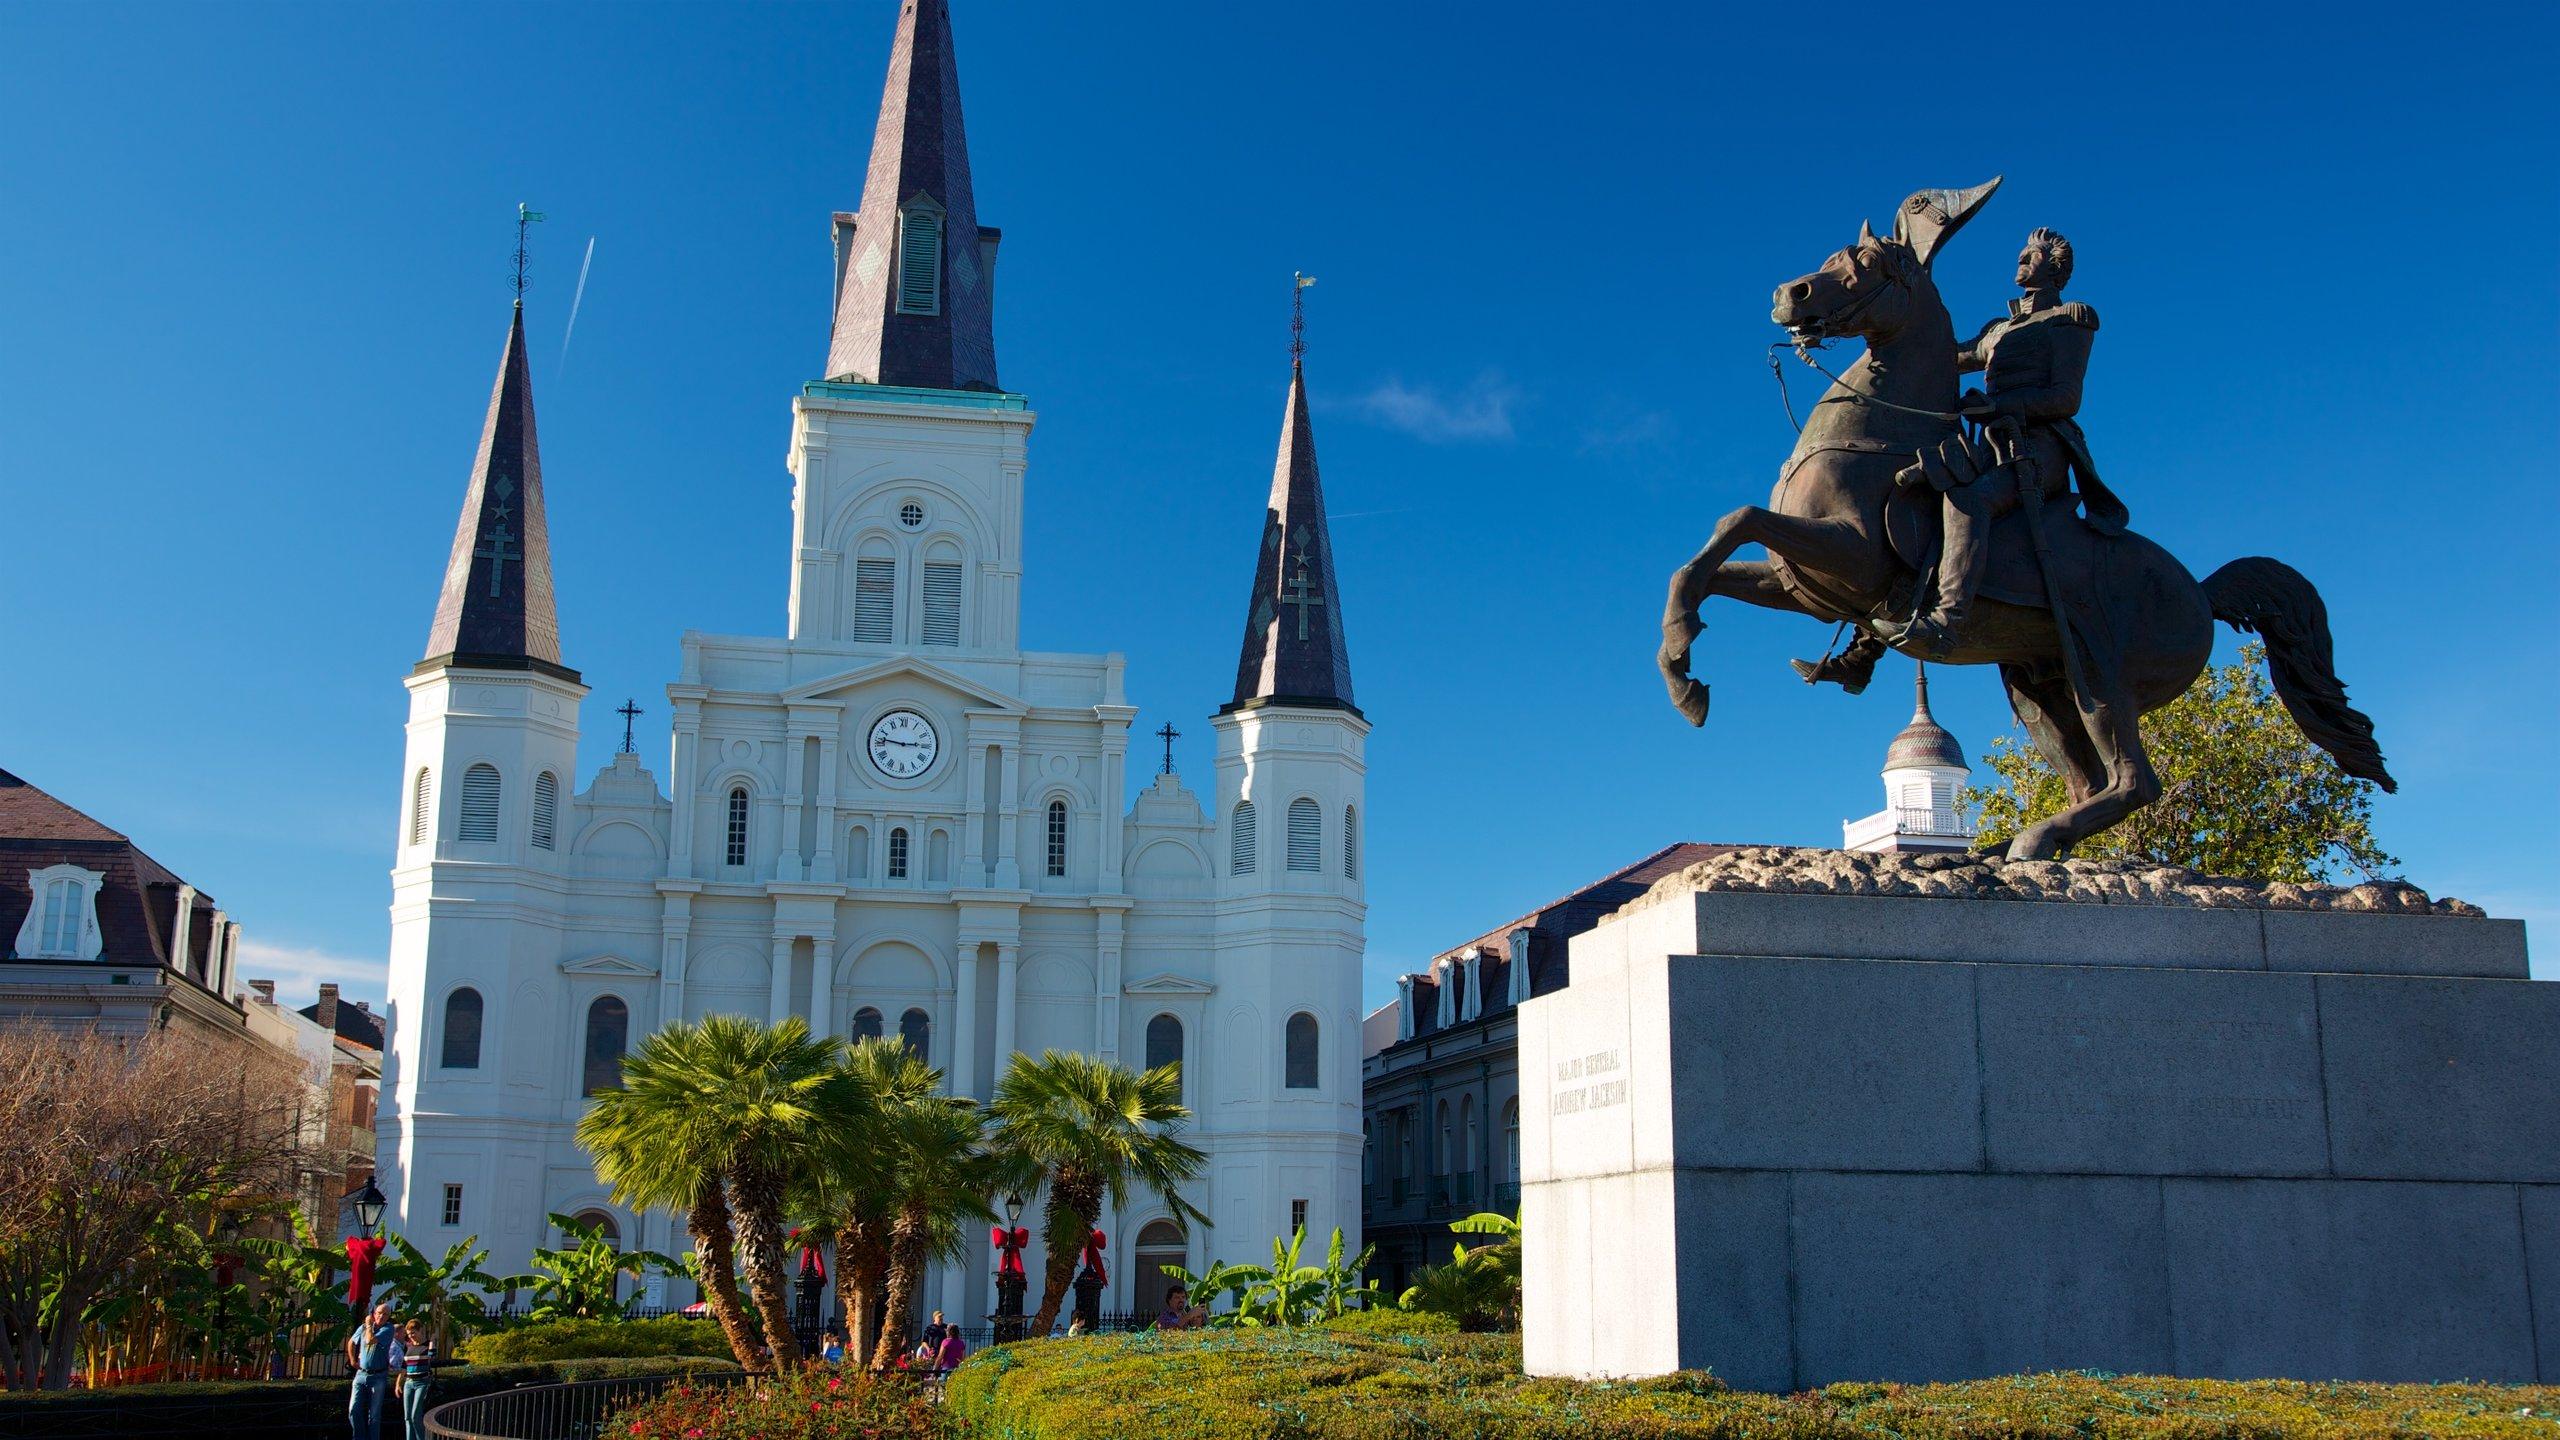 Jackson Square, New Orleans, Louisiana, United States of America